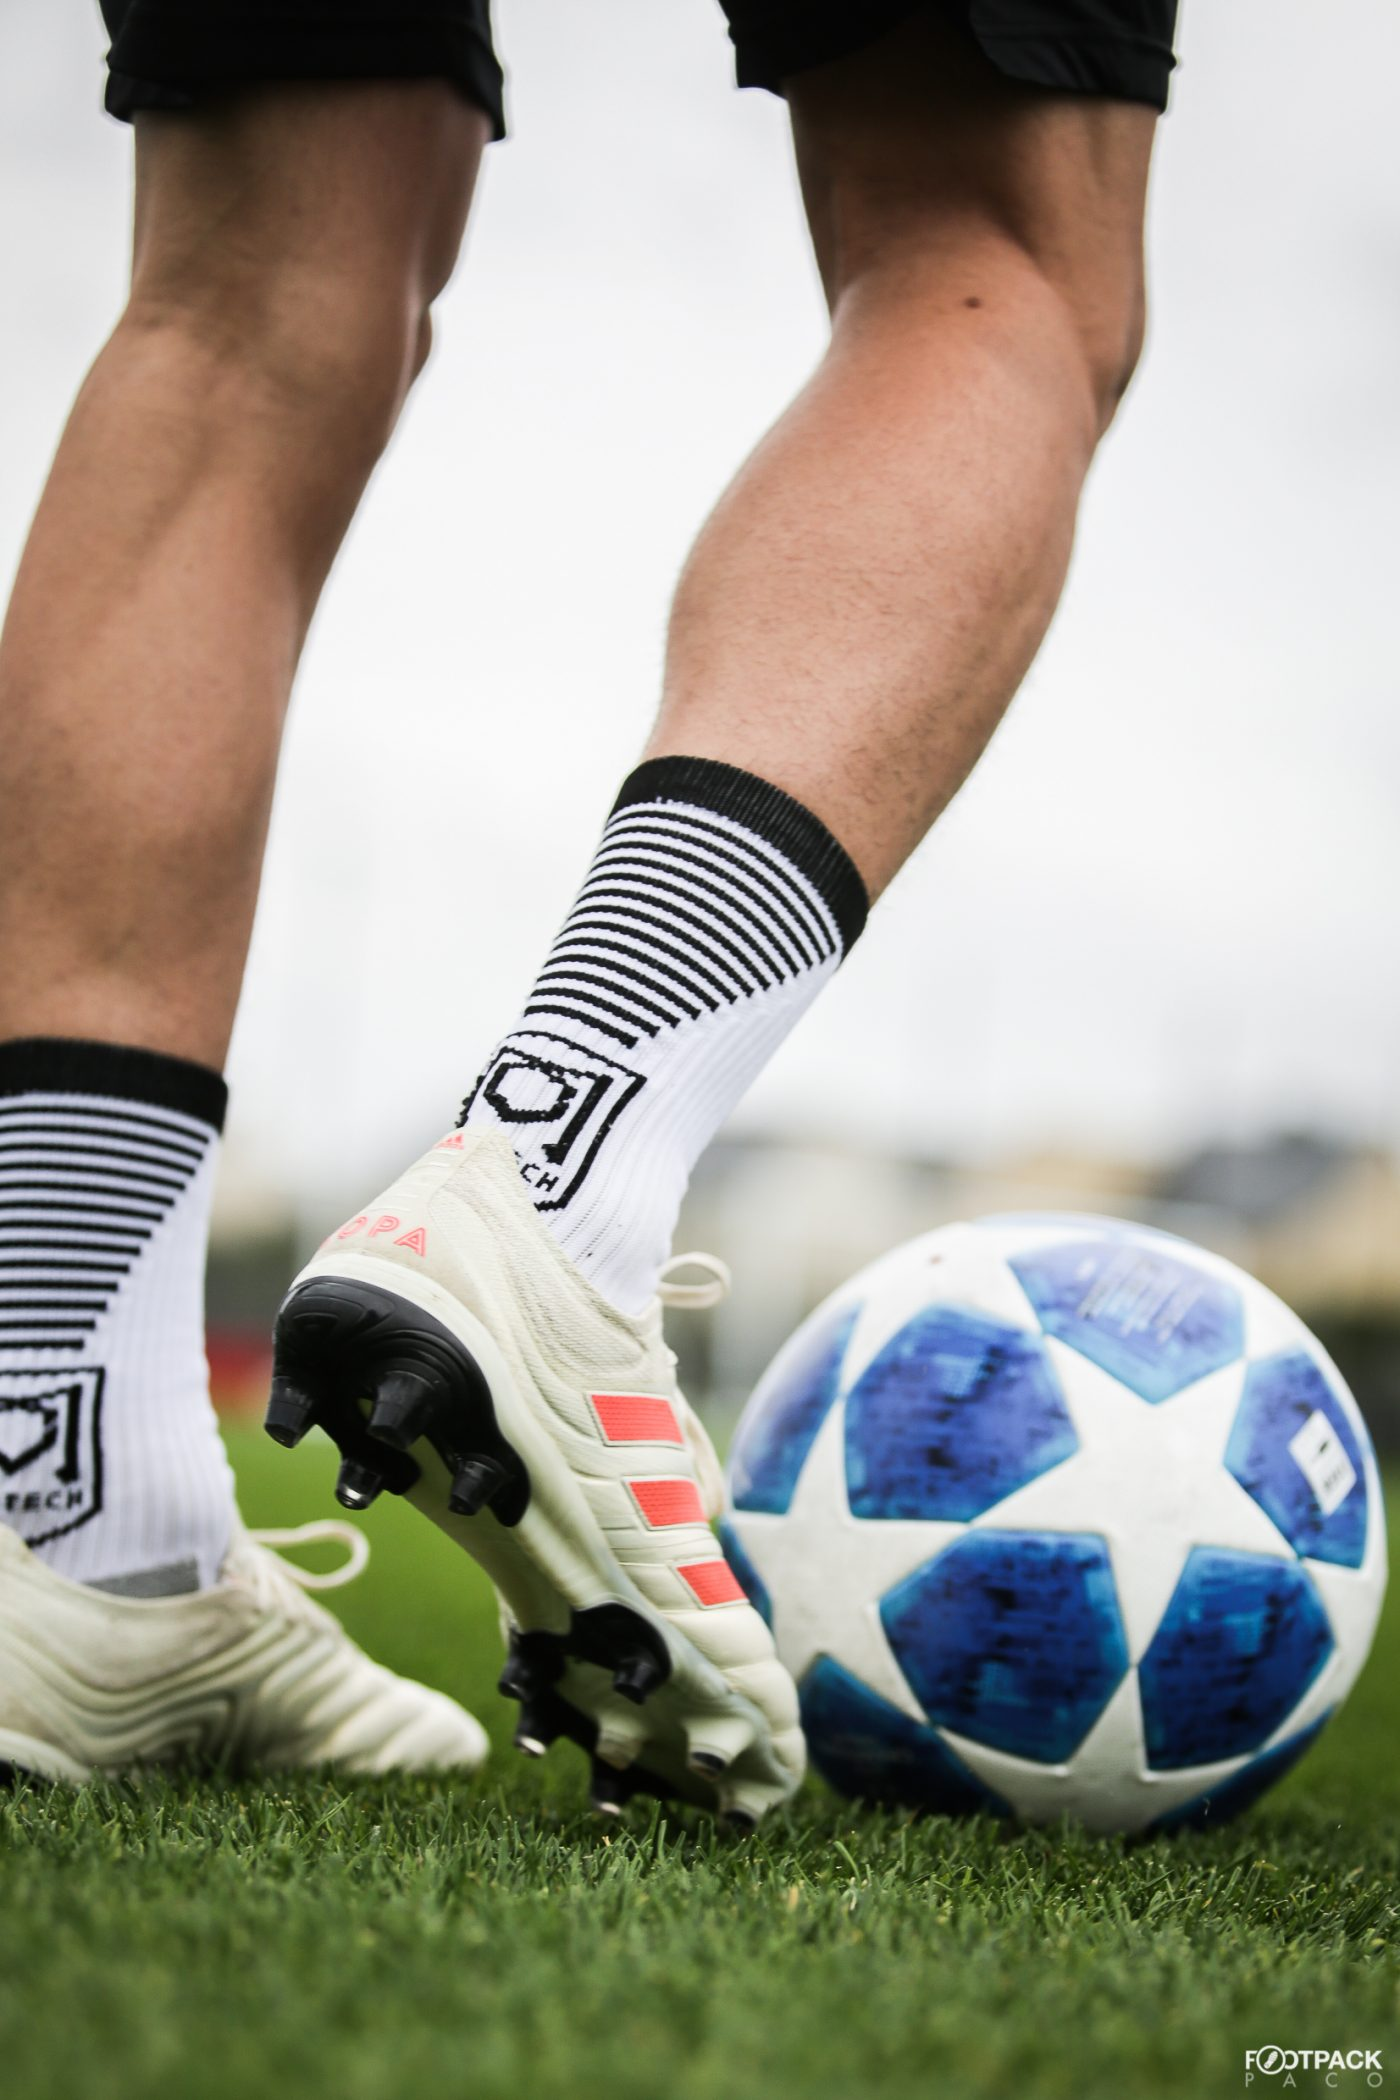 test-chaussettes-mc-protech-football-footpack7